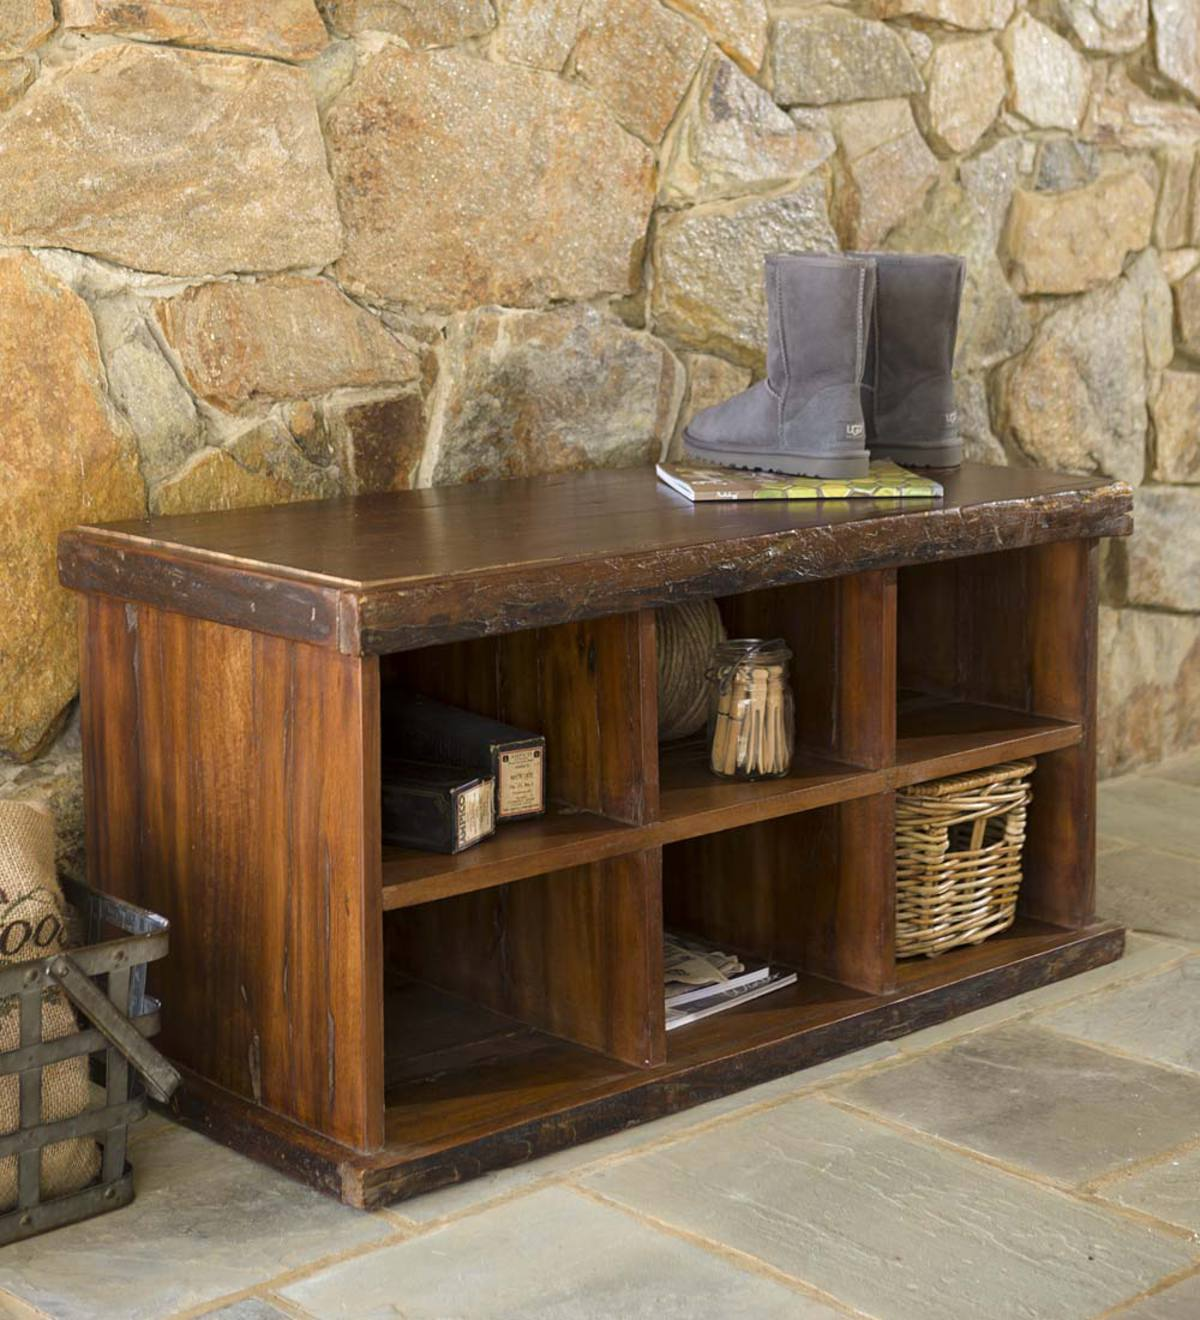 Reclaimed Wood Shoe Storage Bench And Cobbler Coat Rack